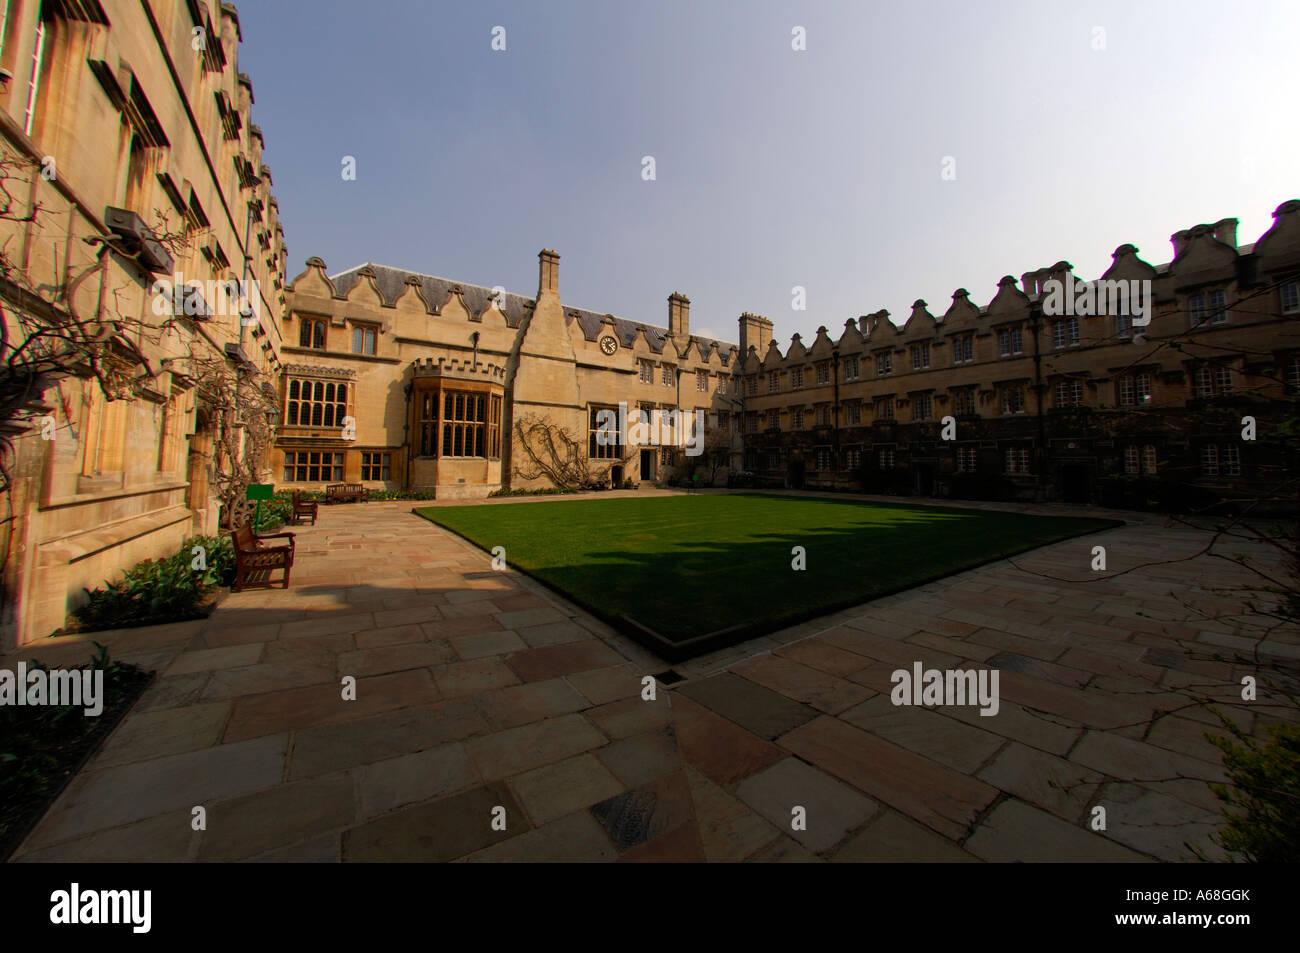 Jesus College Second Quad Oxford - Stock Image